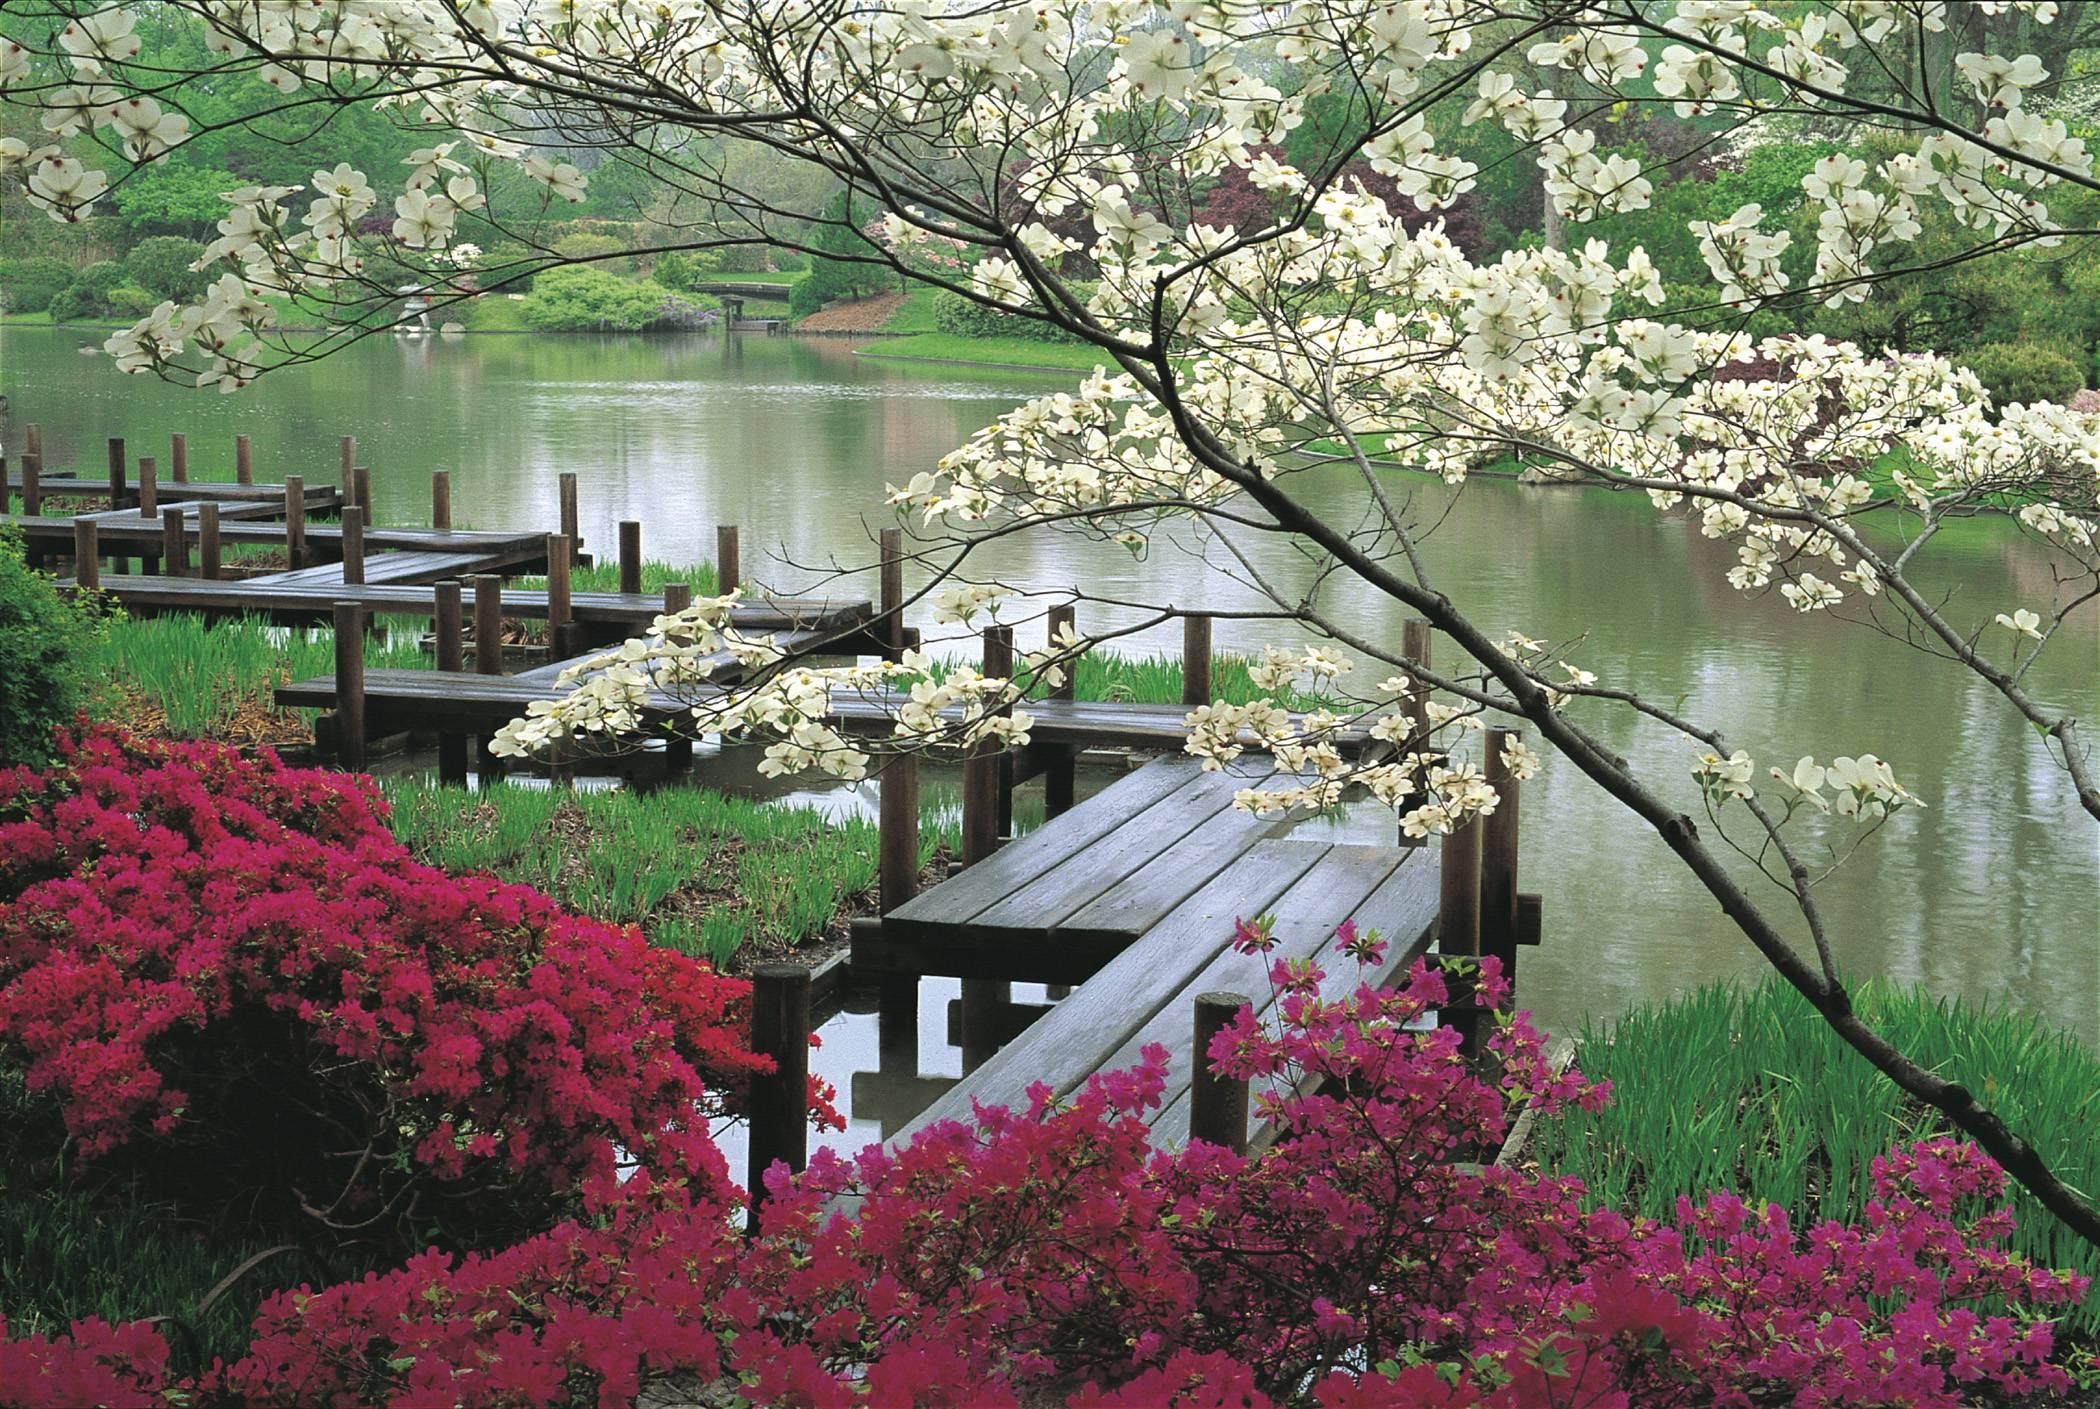 6 poster design photo mockups 57079 - Japanese Garden Wallpaper Japanese Garden Wallpaper Design Awesome 55300 Inspiration Designs